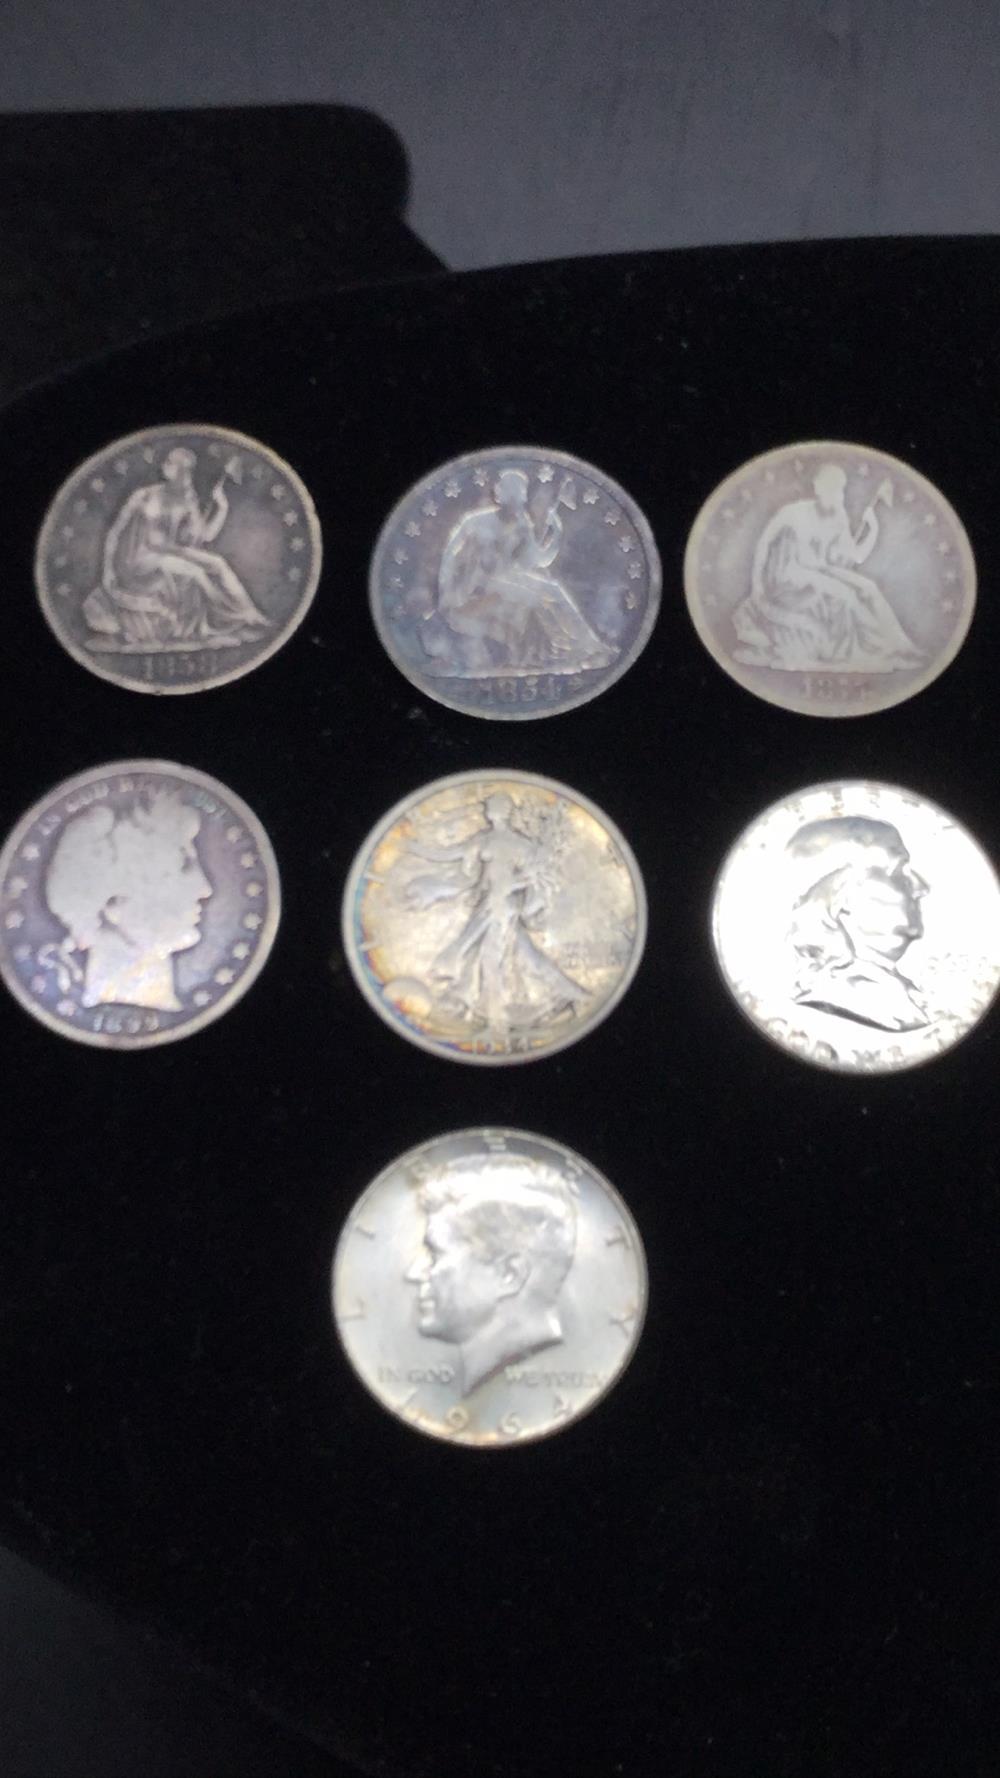 Lot 16: Half dollar coins